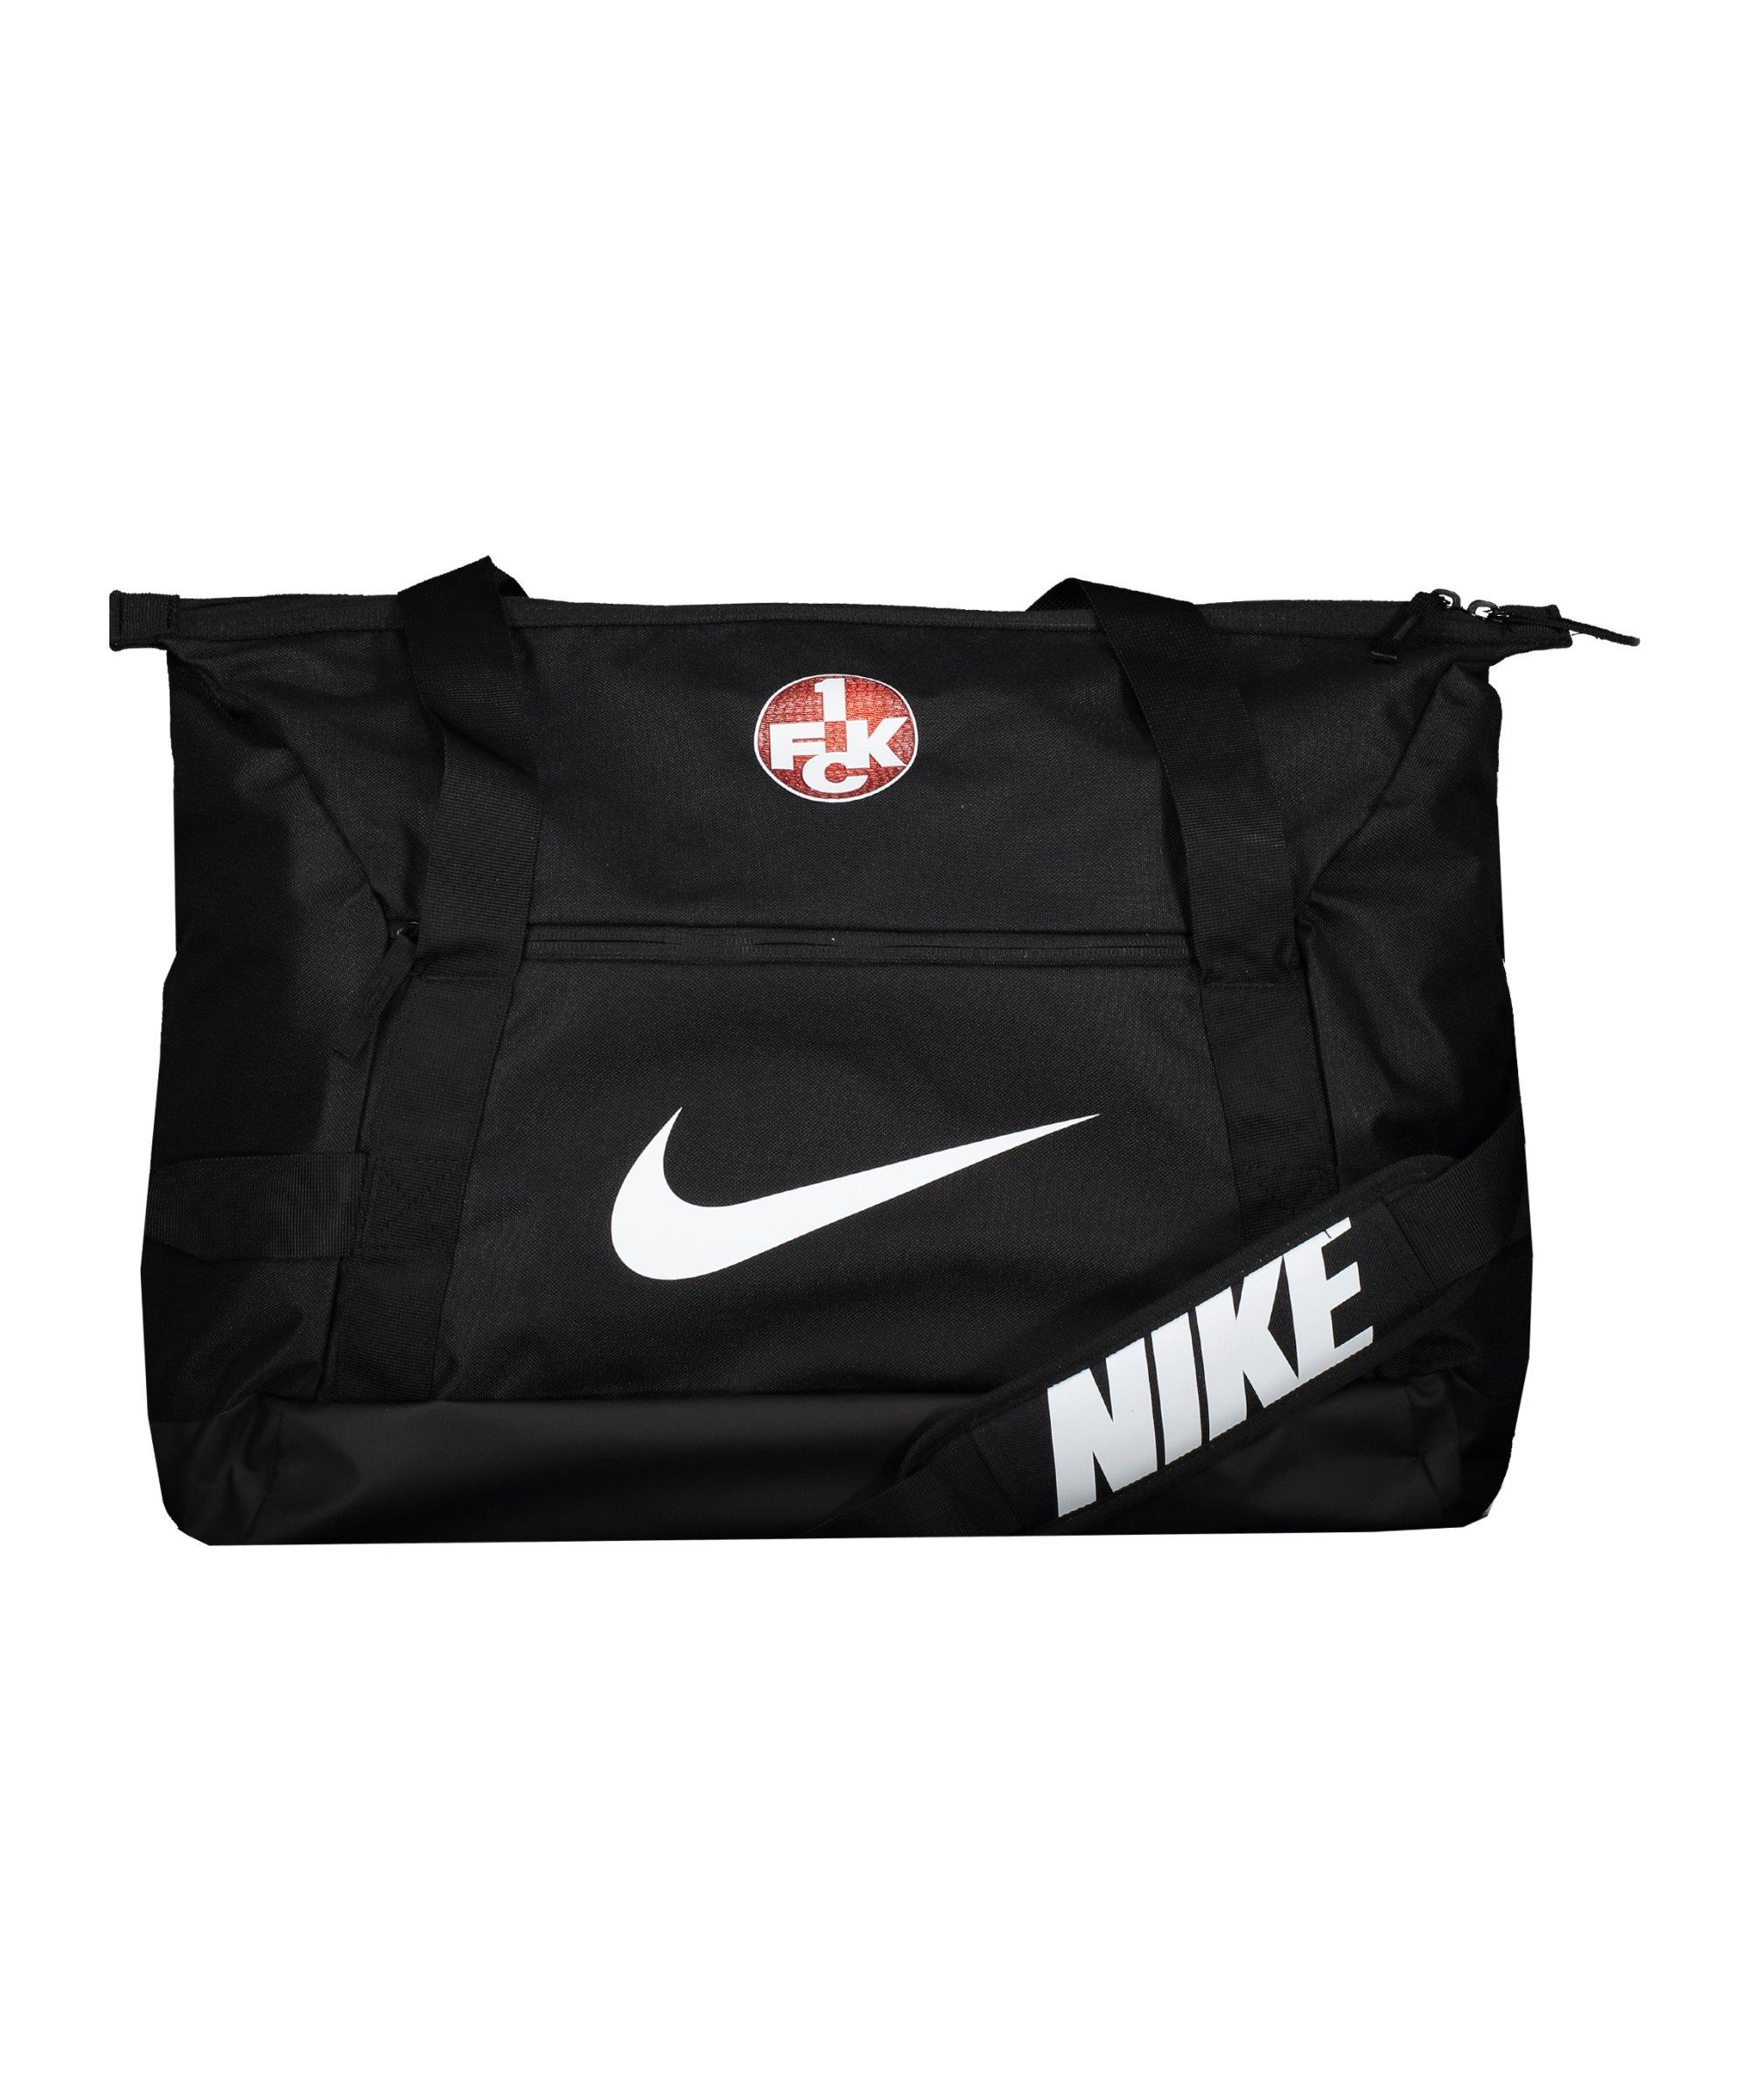 Nike 1. FC Kaiserslautern Duffle Tasche F010 - schwarz